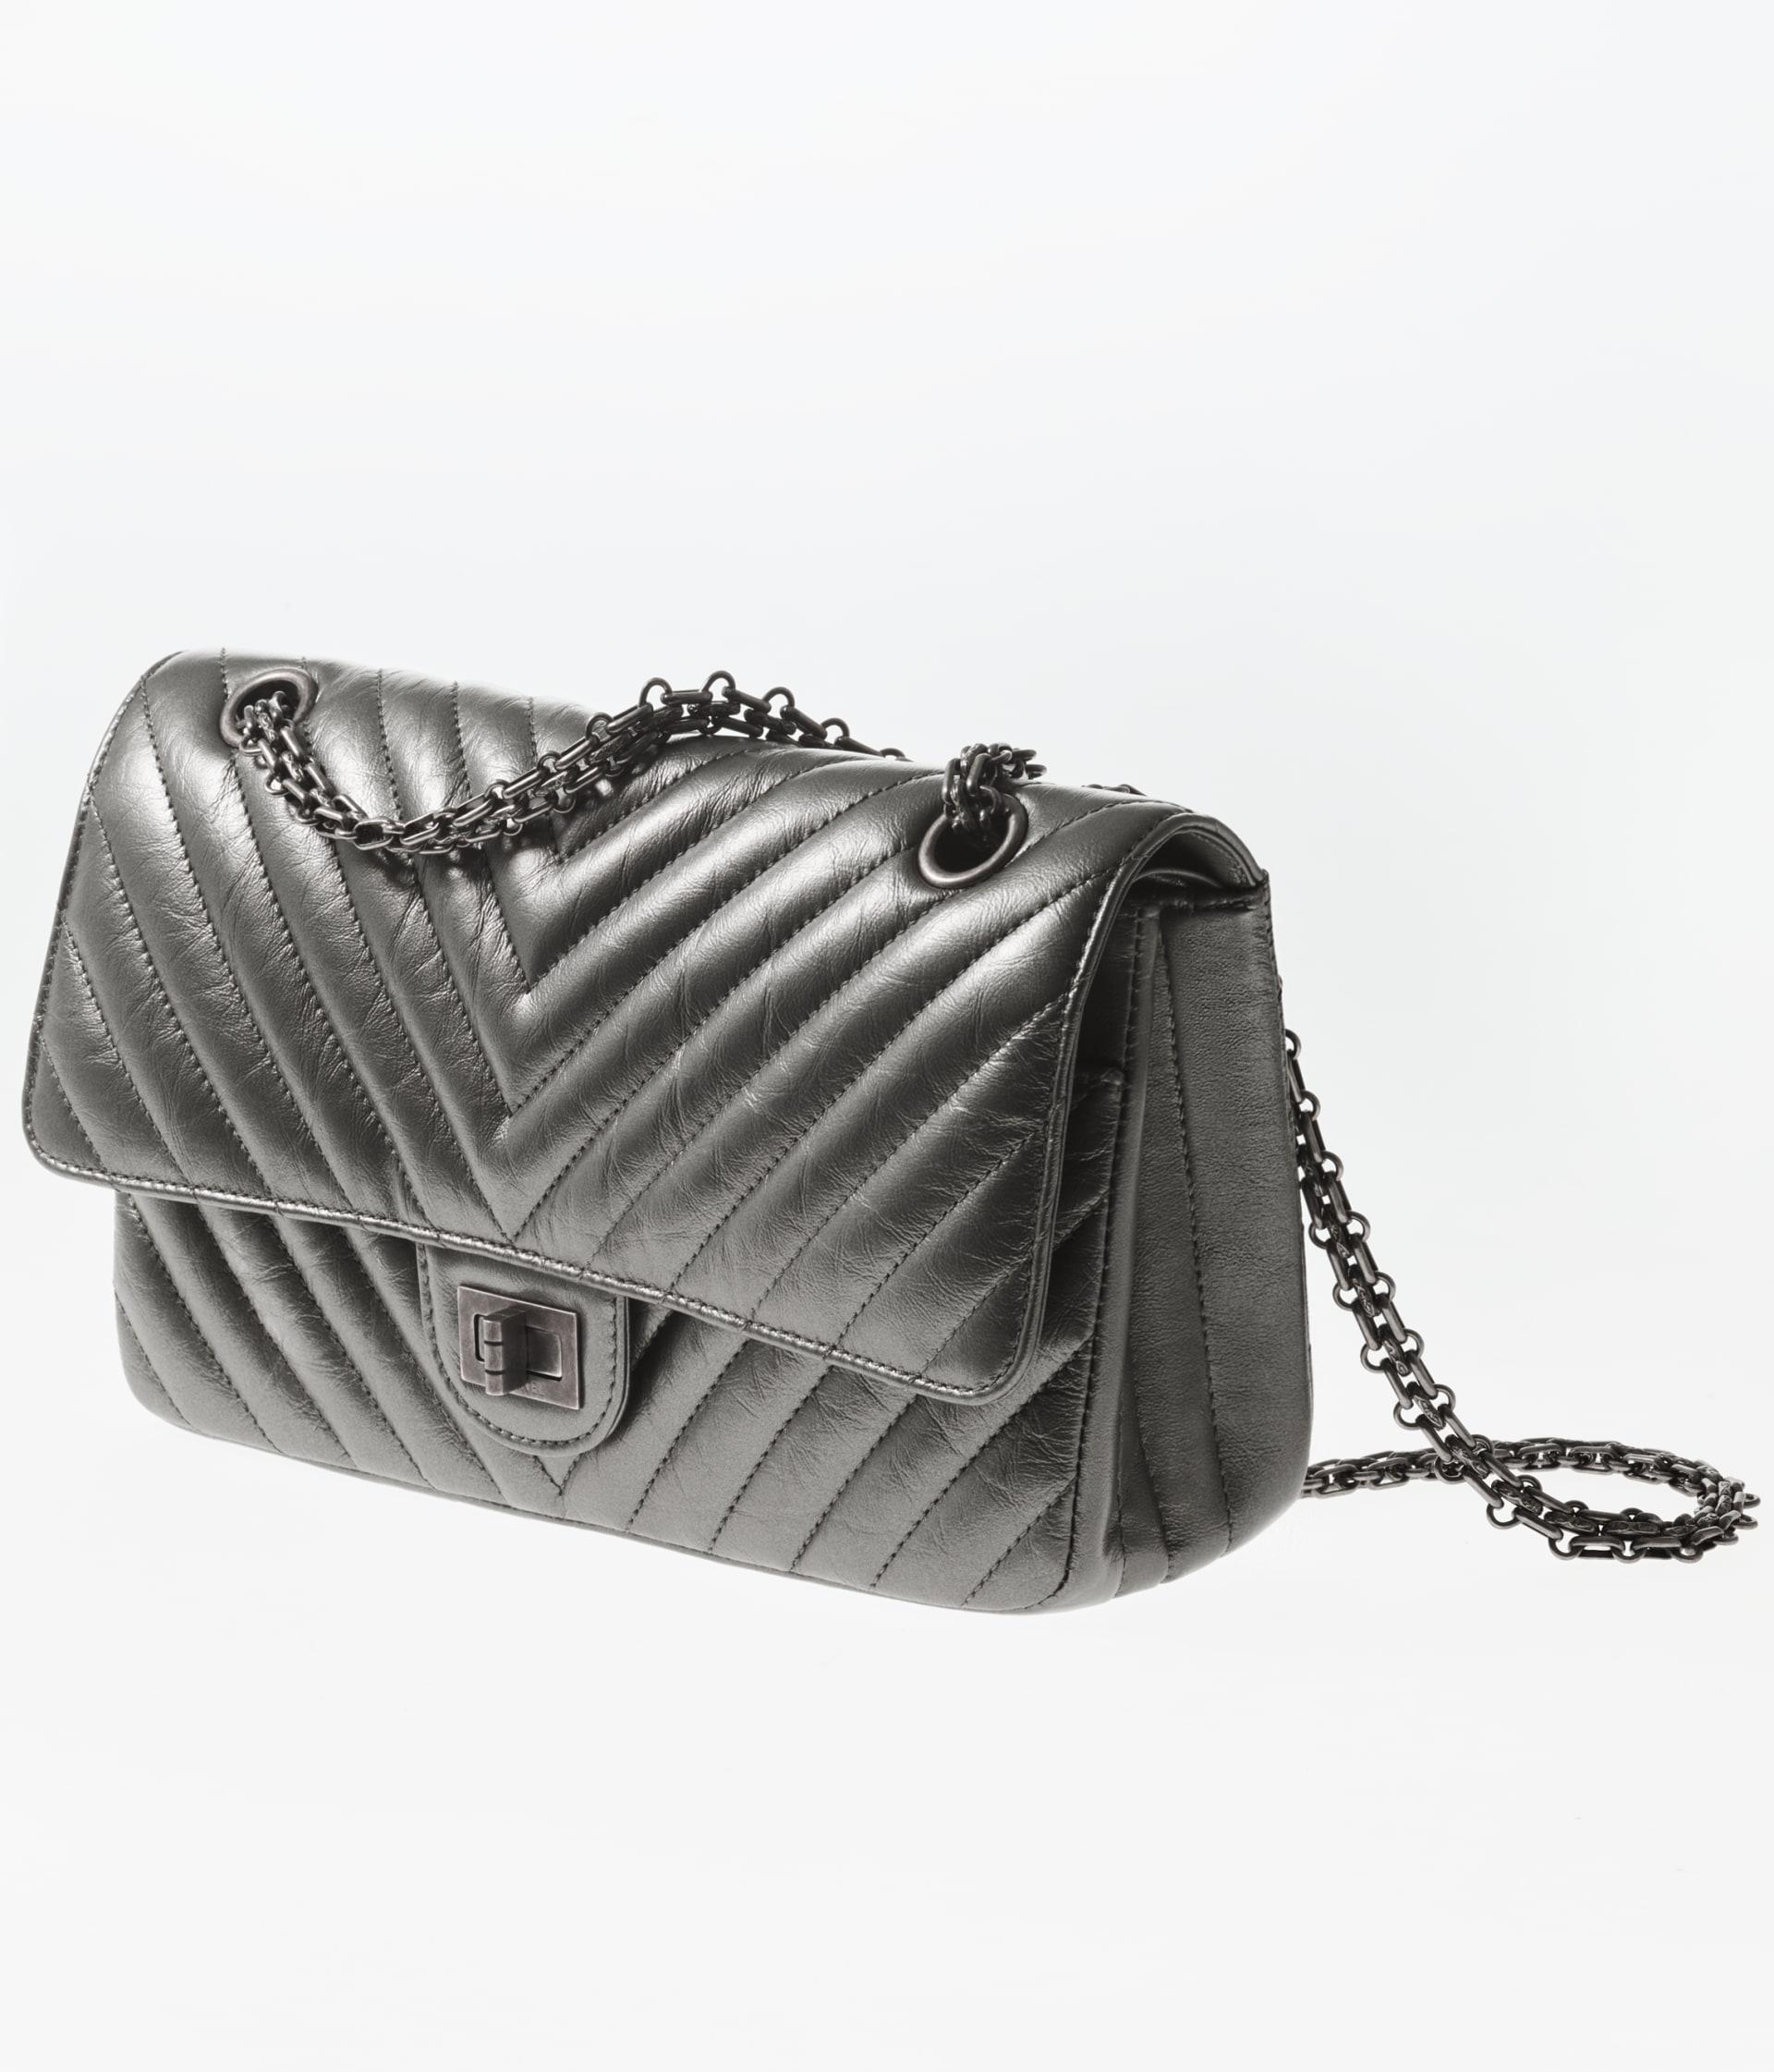 image 2 - 2.55 Handbag - Metallic Aged Calfskin & Ruthenium-Finish Metal - Ruthenium